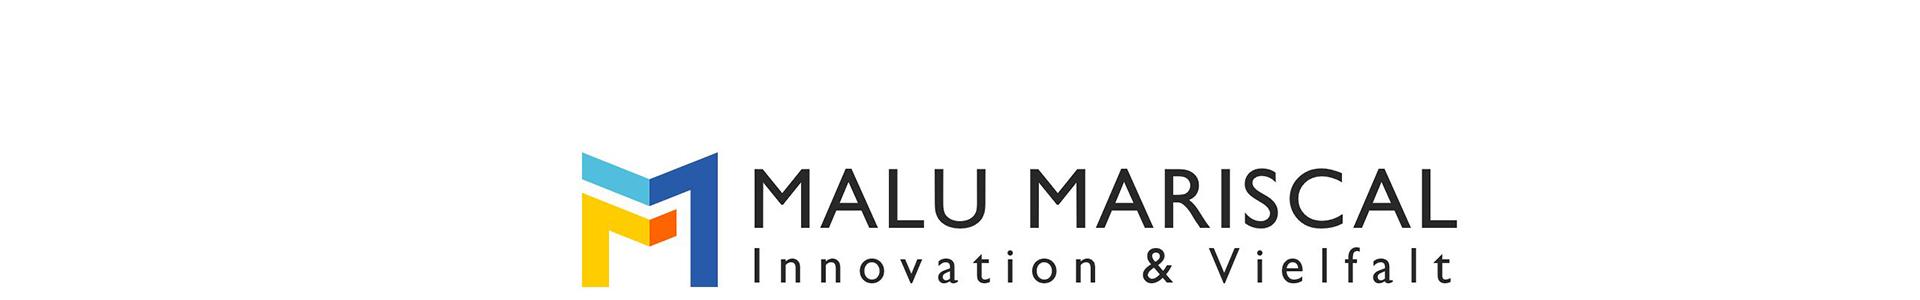 Expert Marketplace - Dr. Maria Luisa Mariscal de Körner